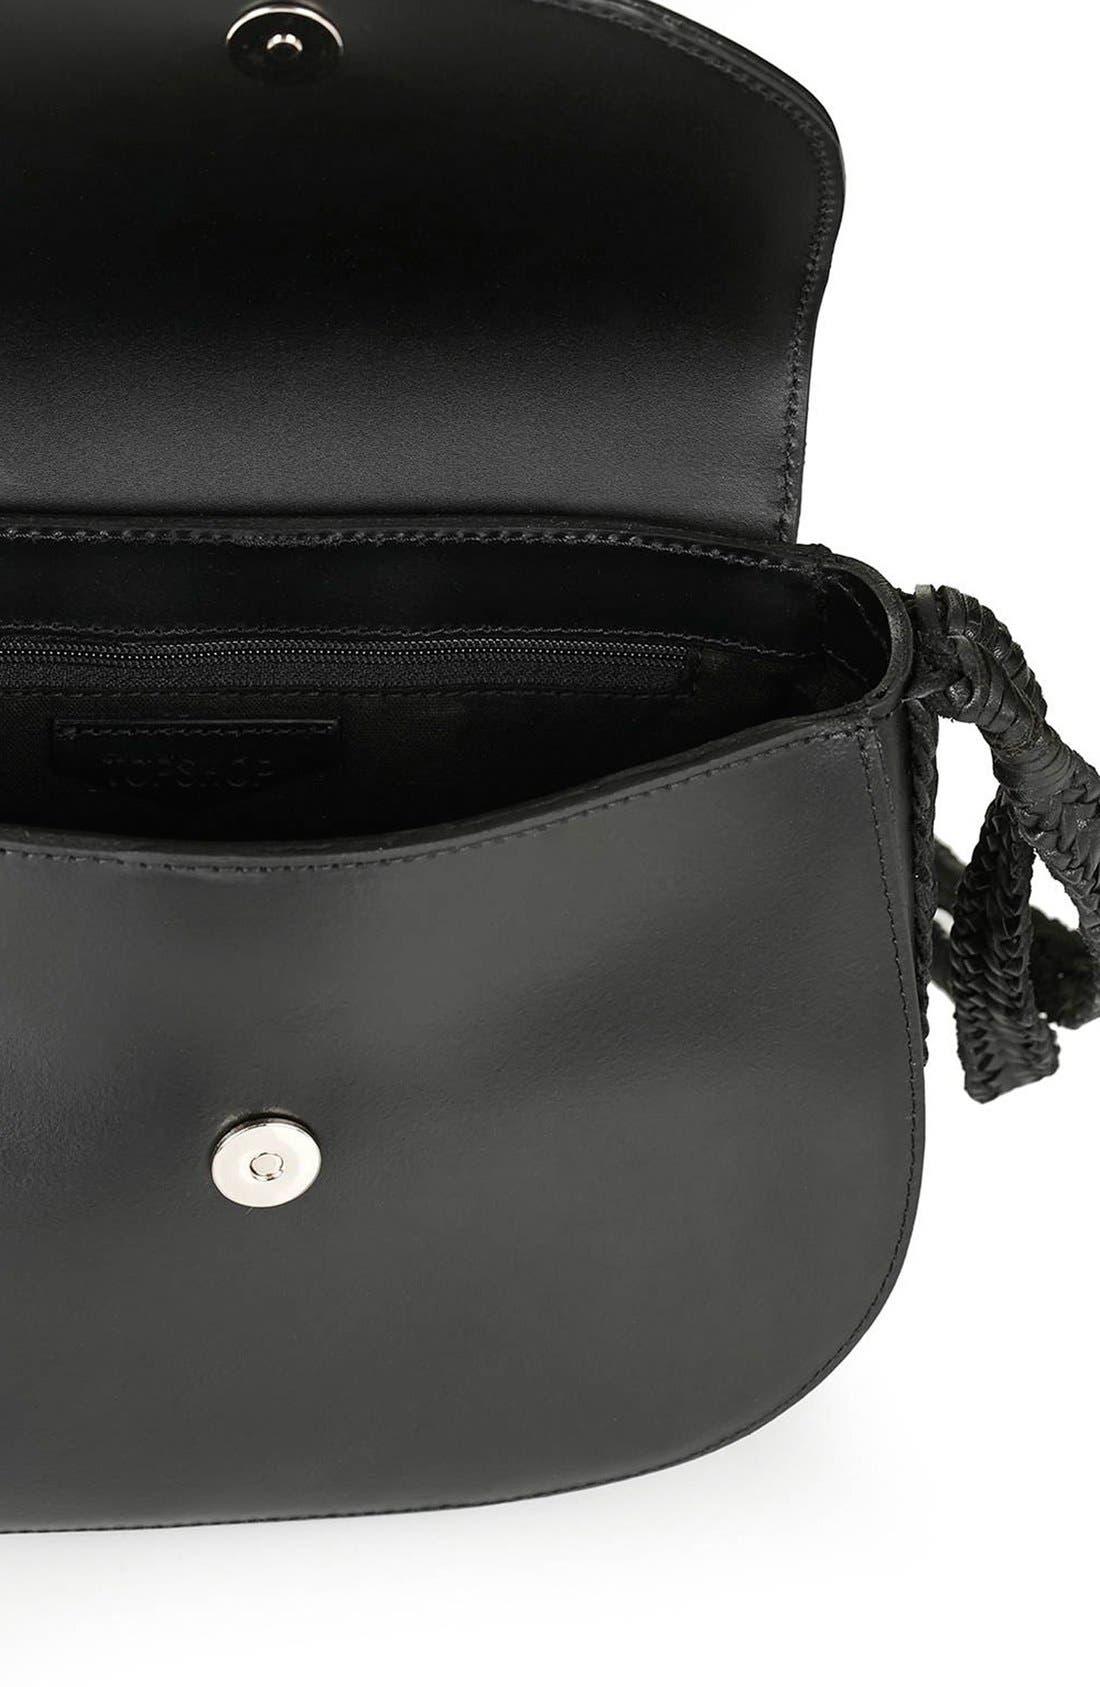 TOPSHOP, Woven Strap Leather Saddle Bag, Alternate thumbnail 2, color, 001